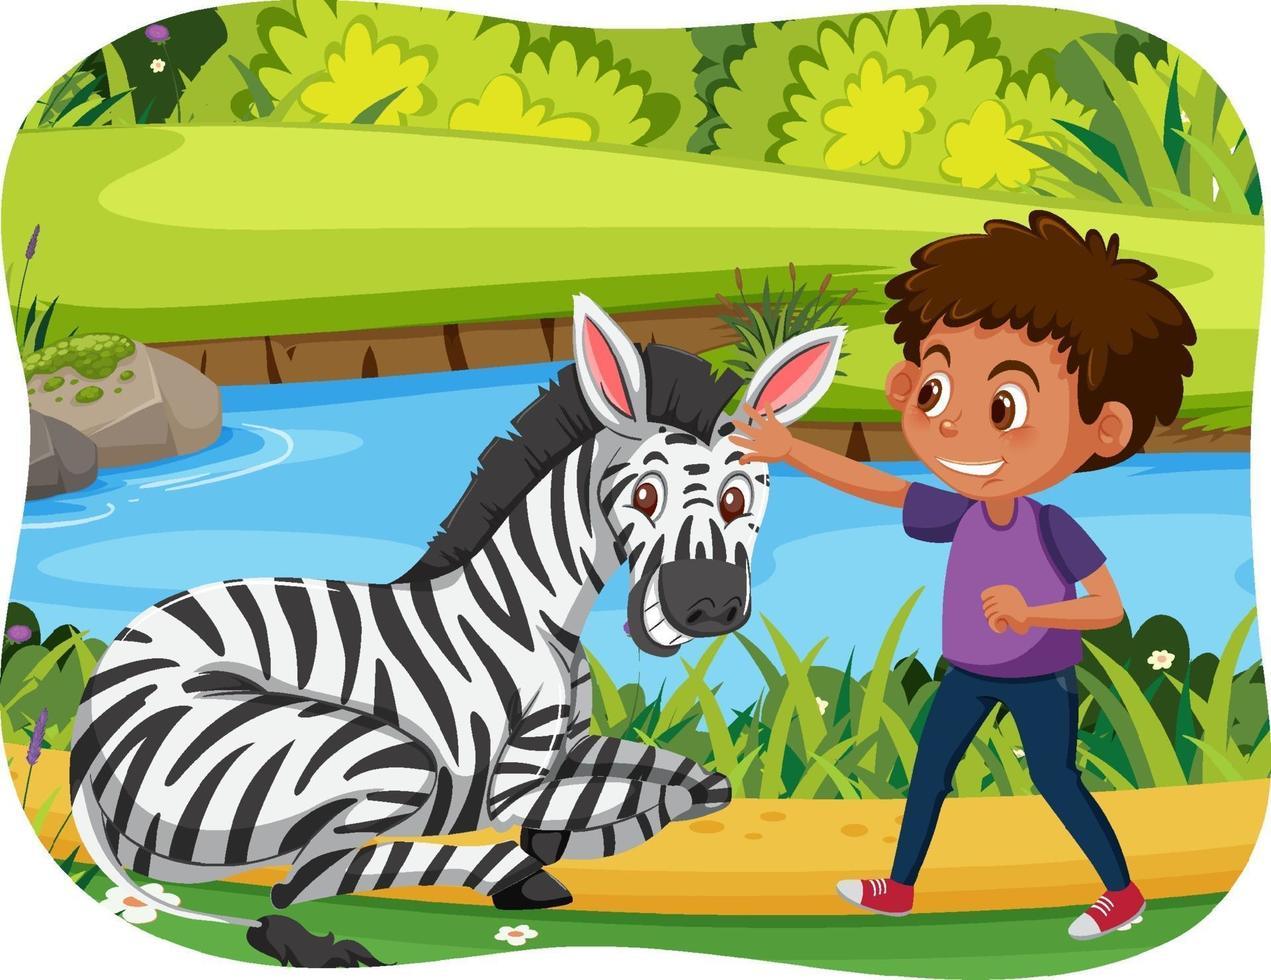 glada barn med djur i natur bakgrund vektor